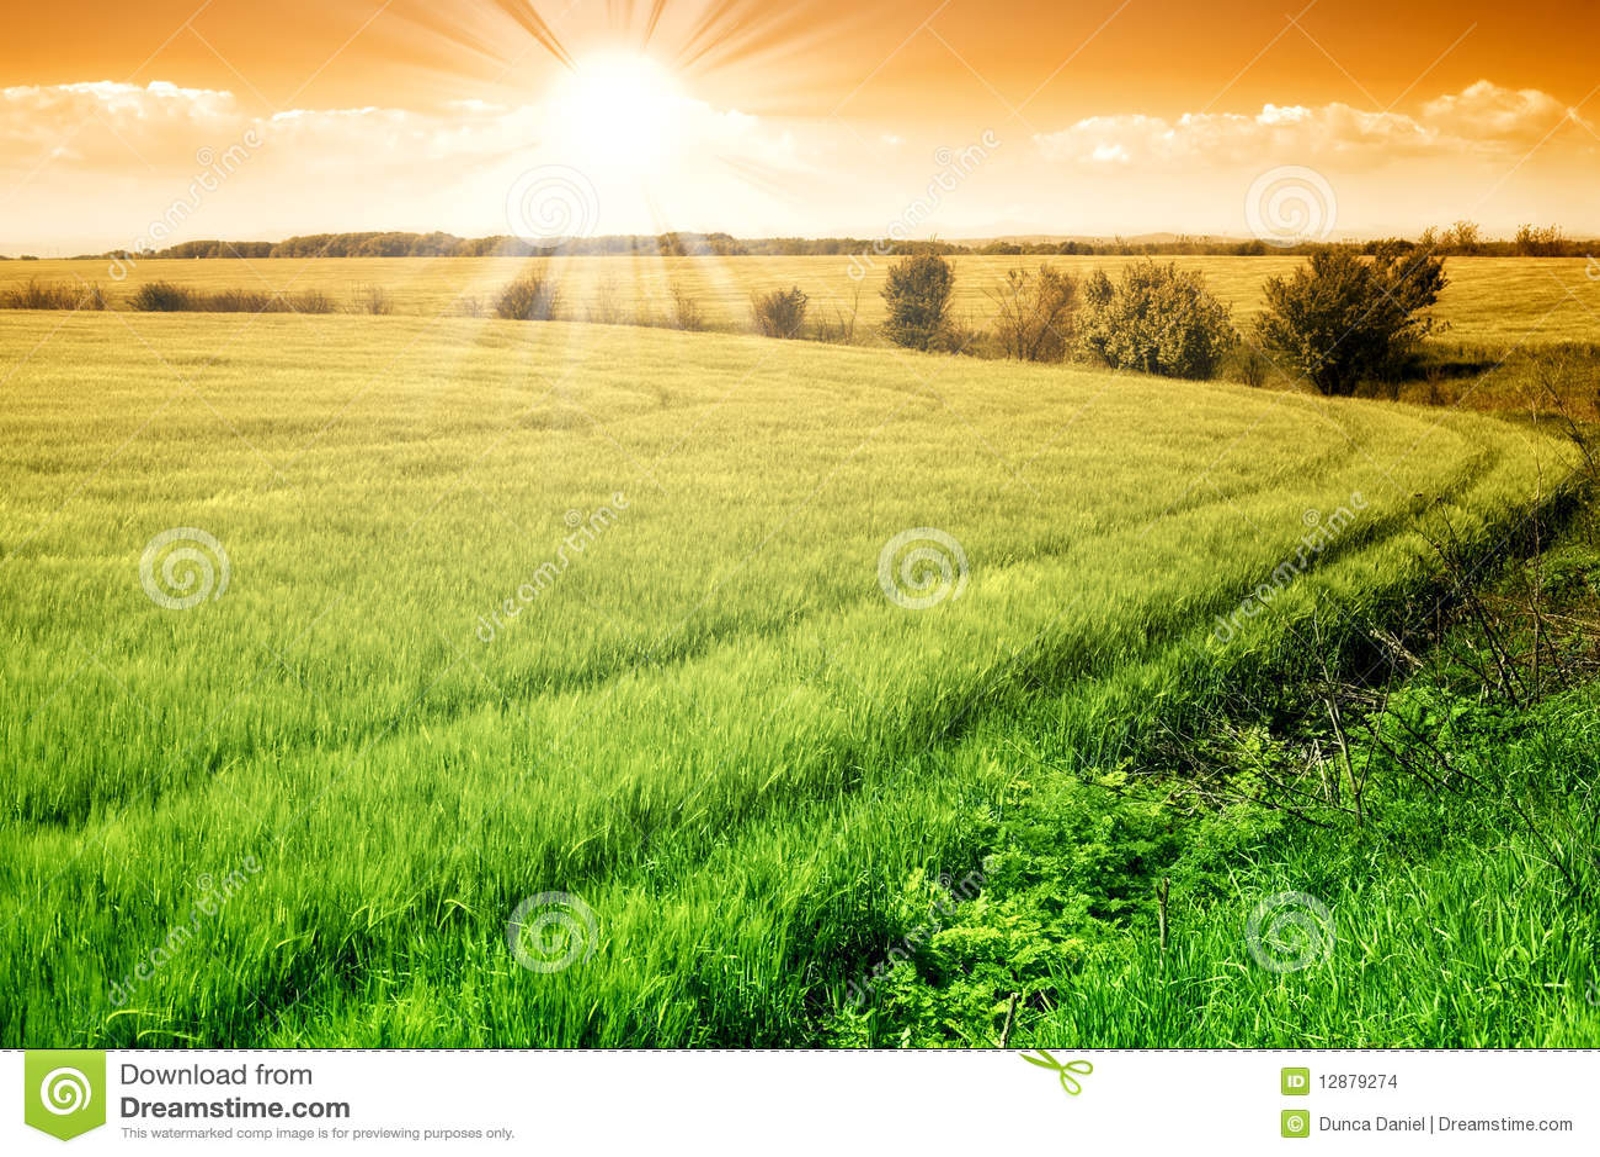 Field of green fresh grain and sunny sky